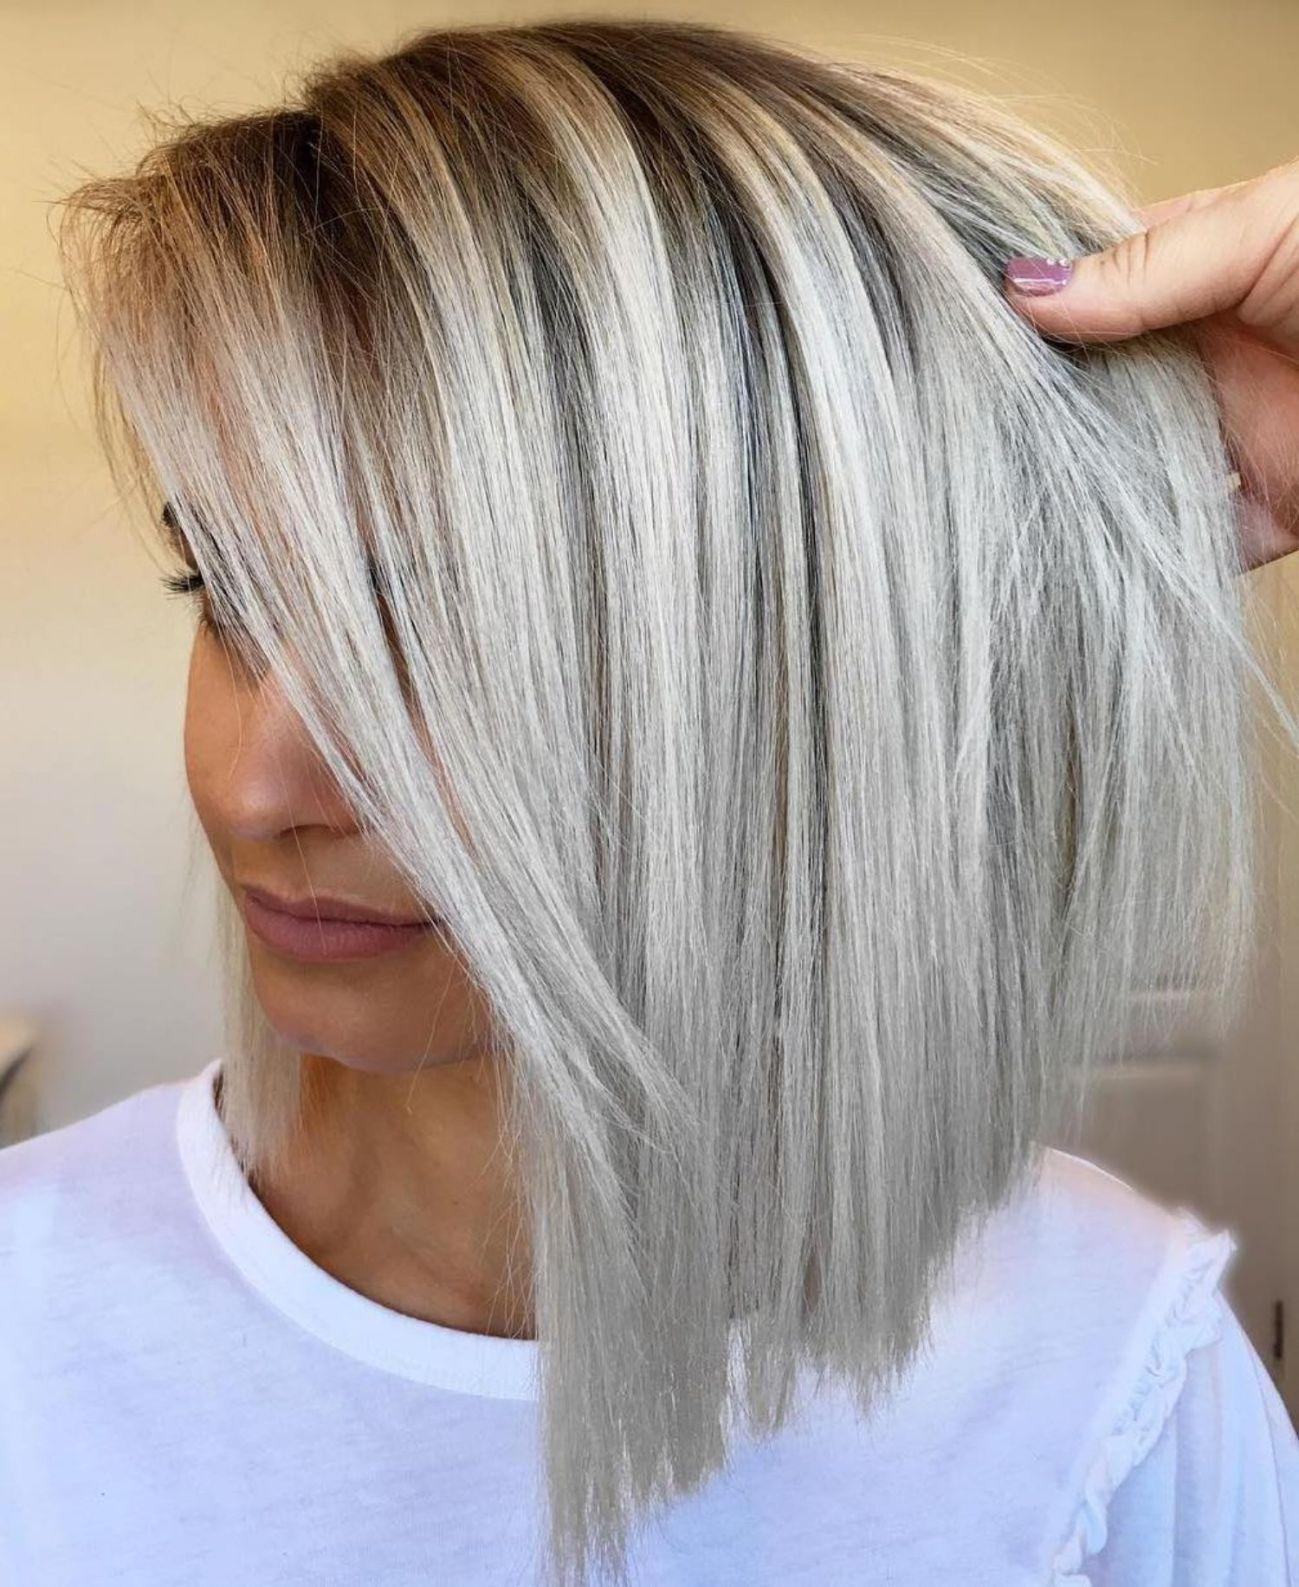 70 Devastatingly Cool Haircuts For Thin Hair In 2020 Thin Hair Haircuts Thin Fine Hair Hairstyles For Thin Hair